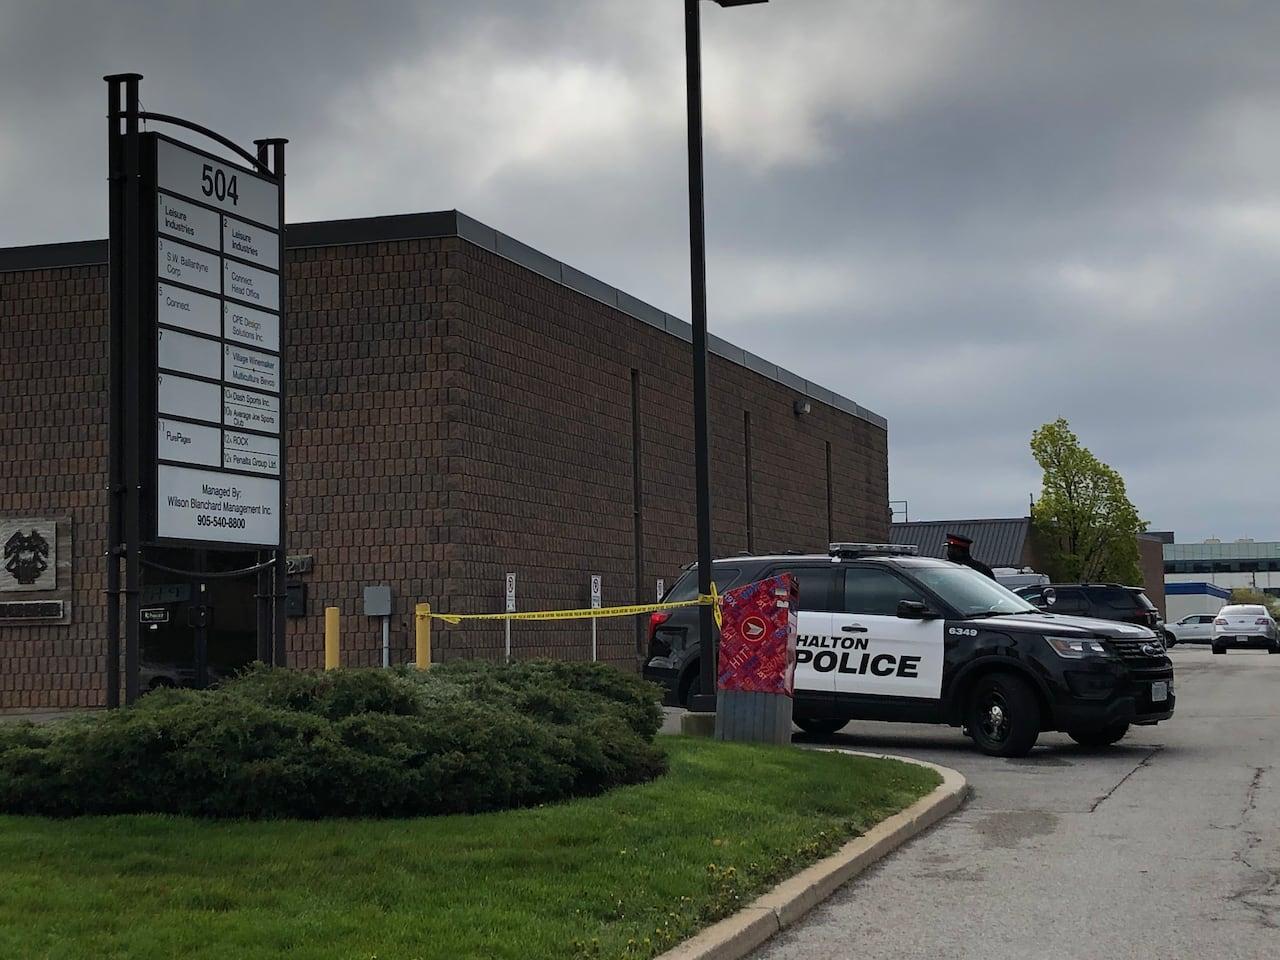 2 Men Dead 2 Injured Following Shooting In Parking Lot In Oakville Cbc News